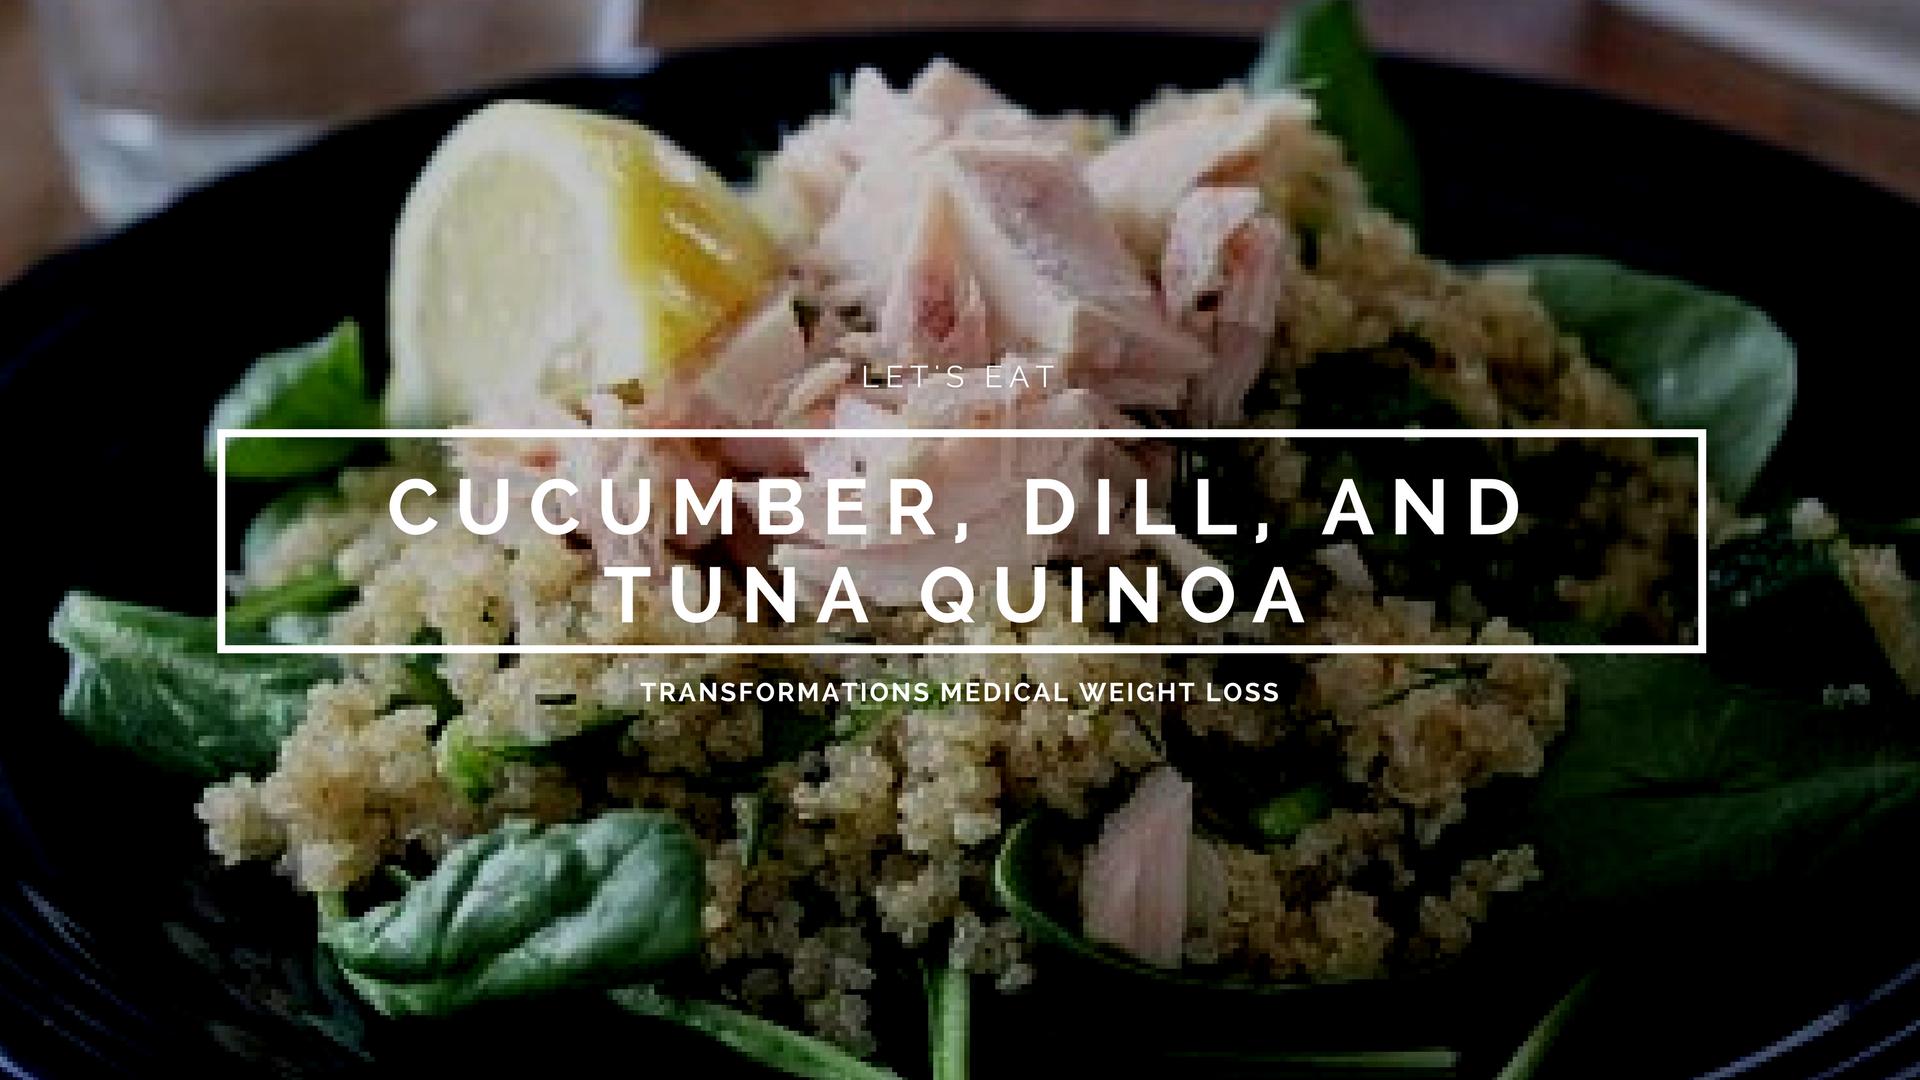 Cucumber, Dill, and Tuna Quinoa